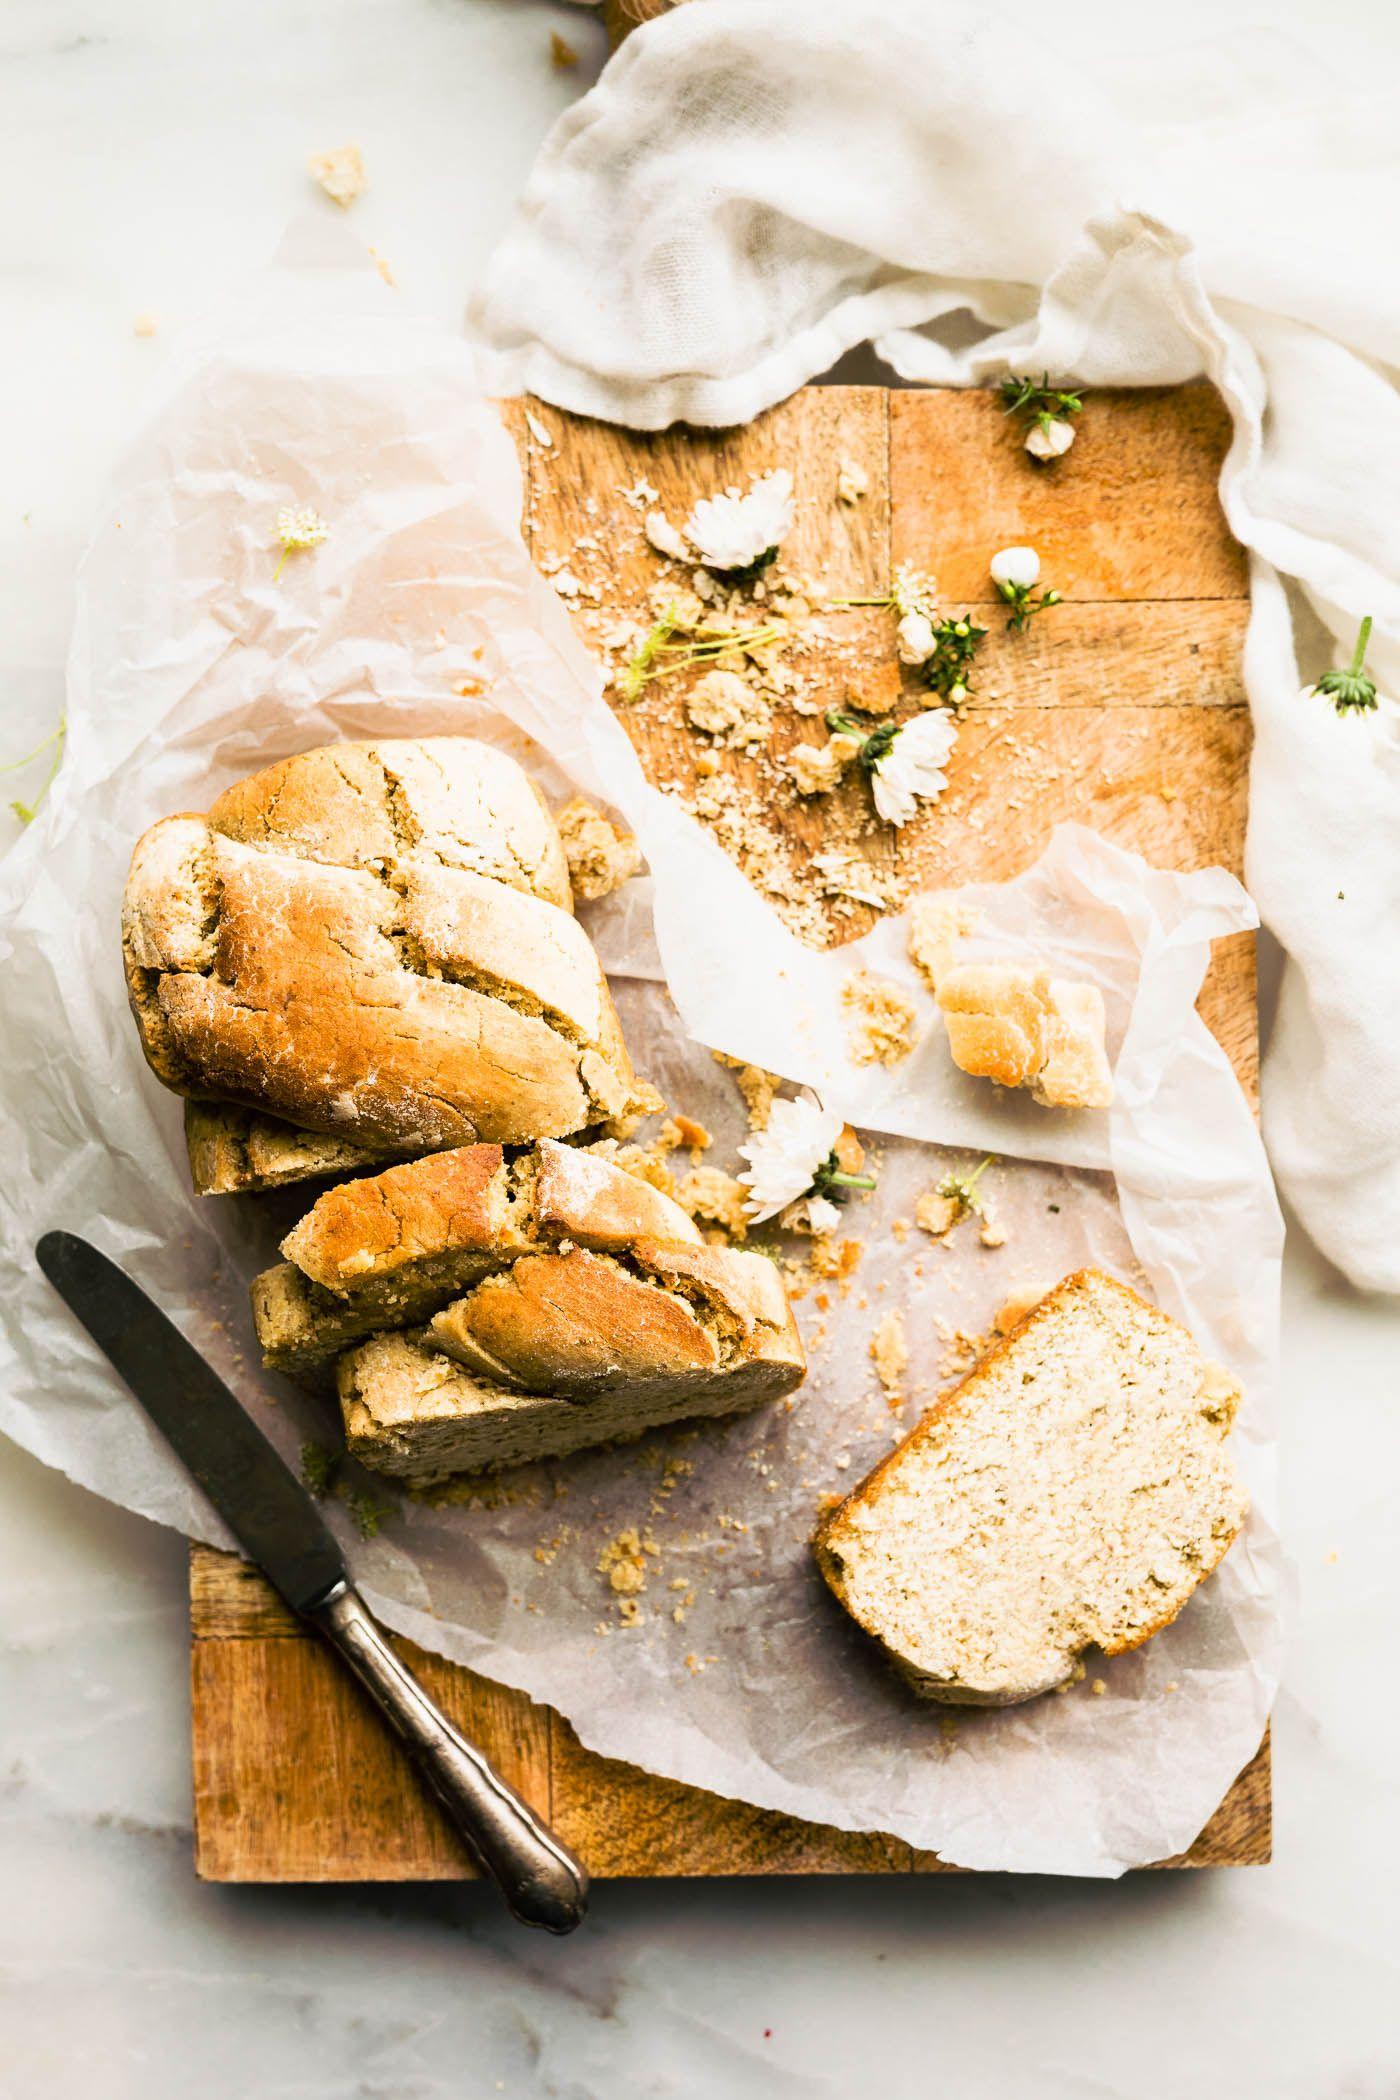 Easy Homemade Vegan Bread (GlutenFree and SoyFree